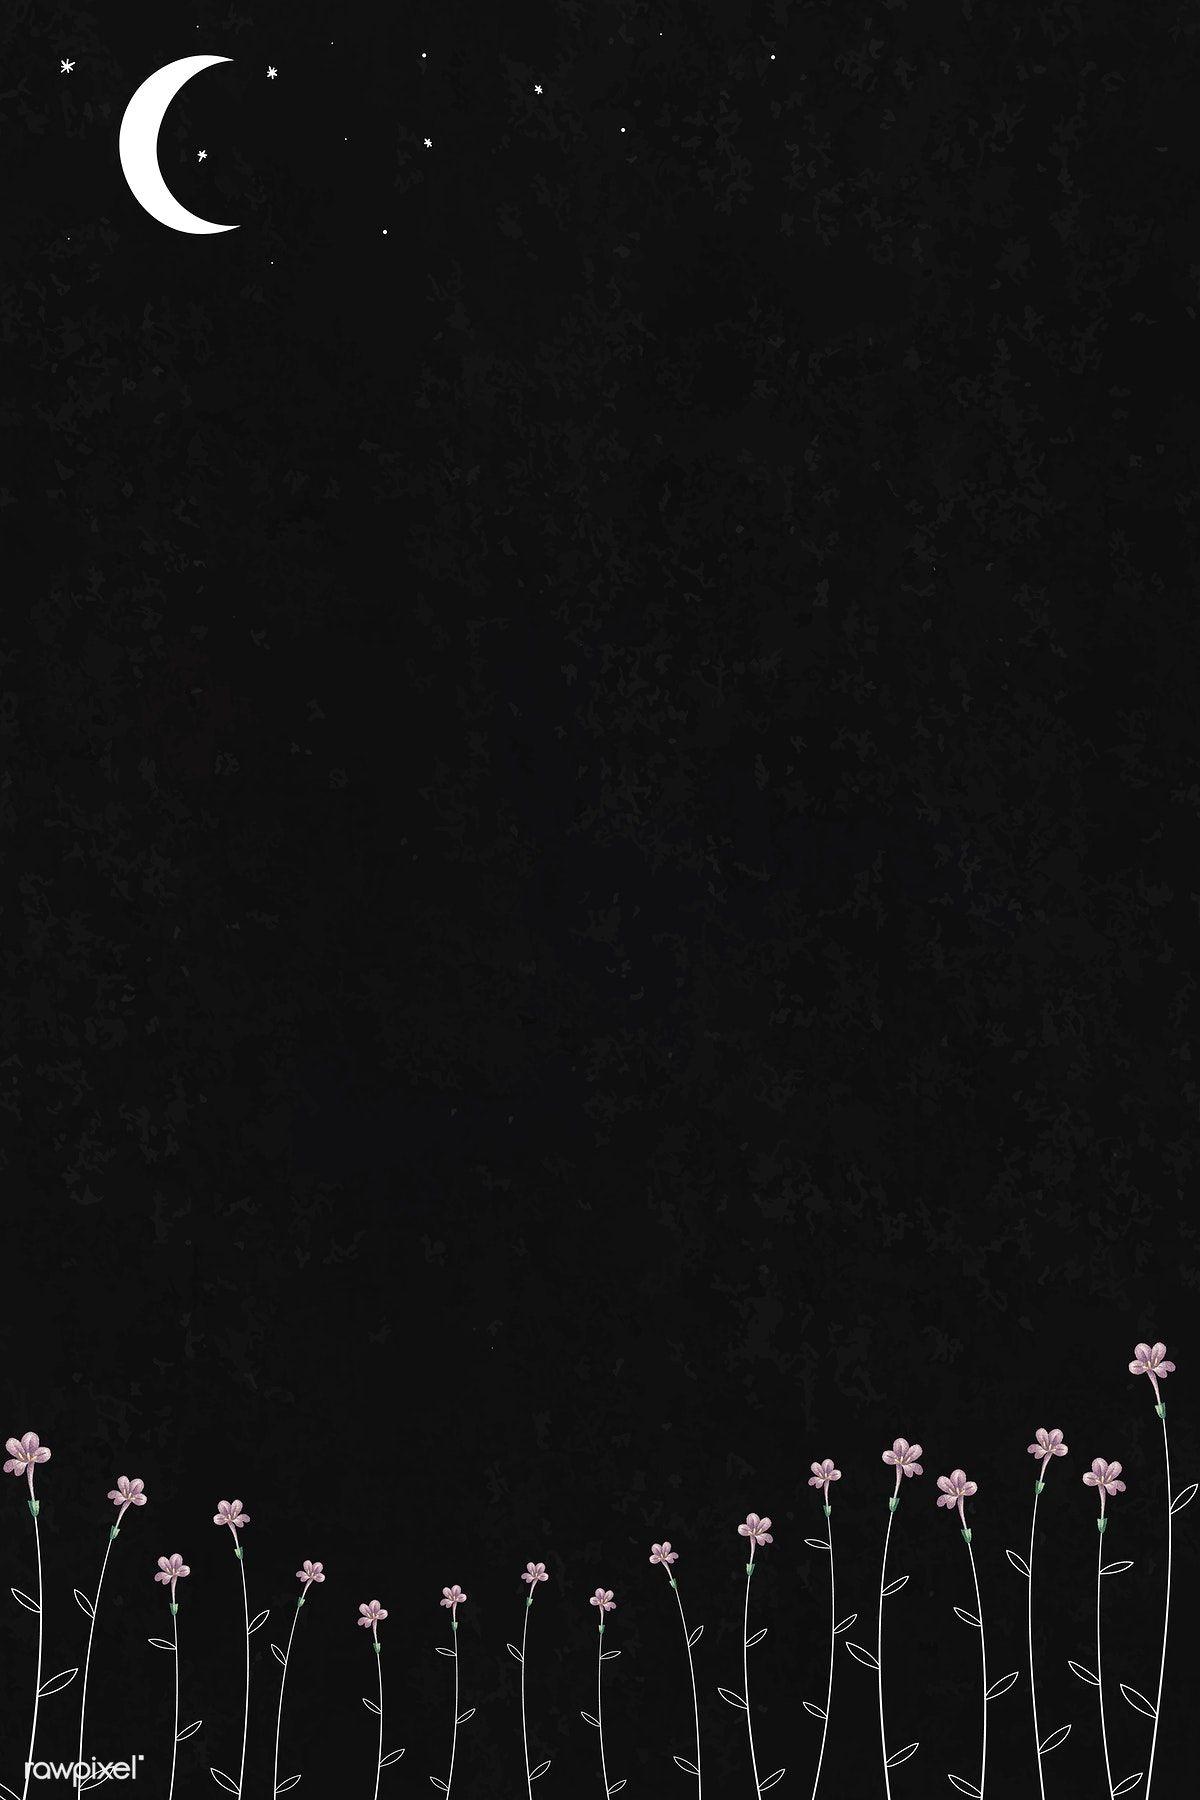 Get Good Black Wallpaper Iphone Dark for iPhone 11 Pro Today